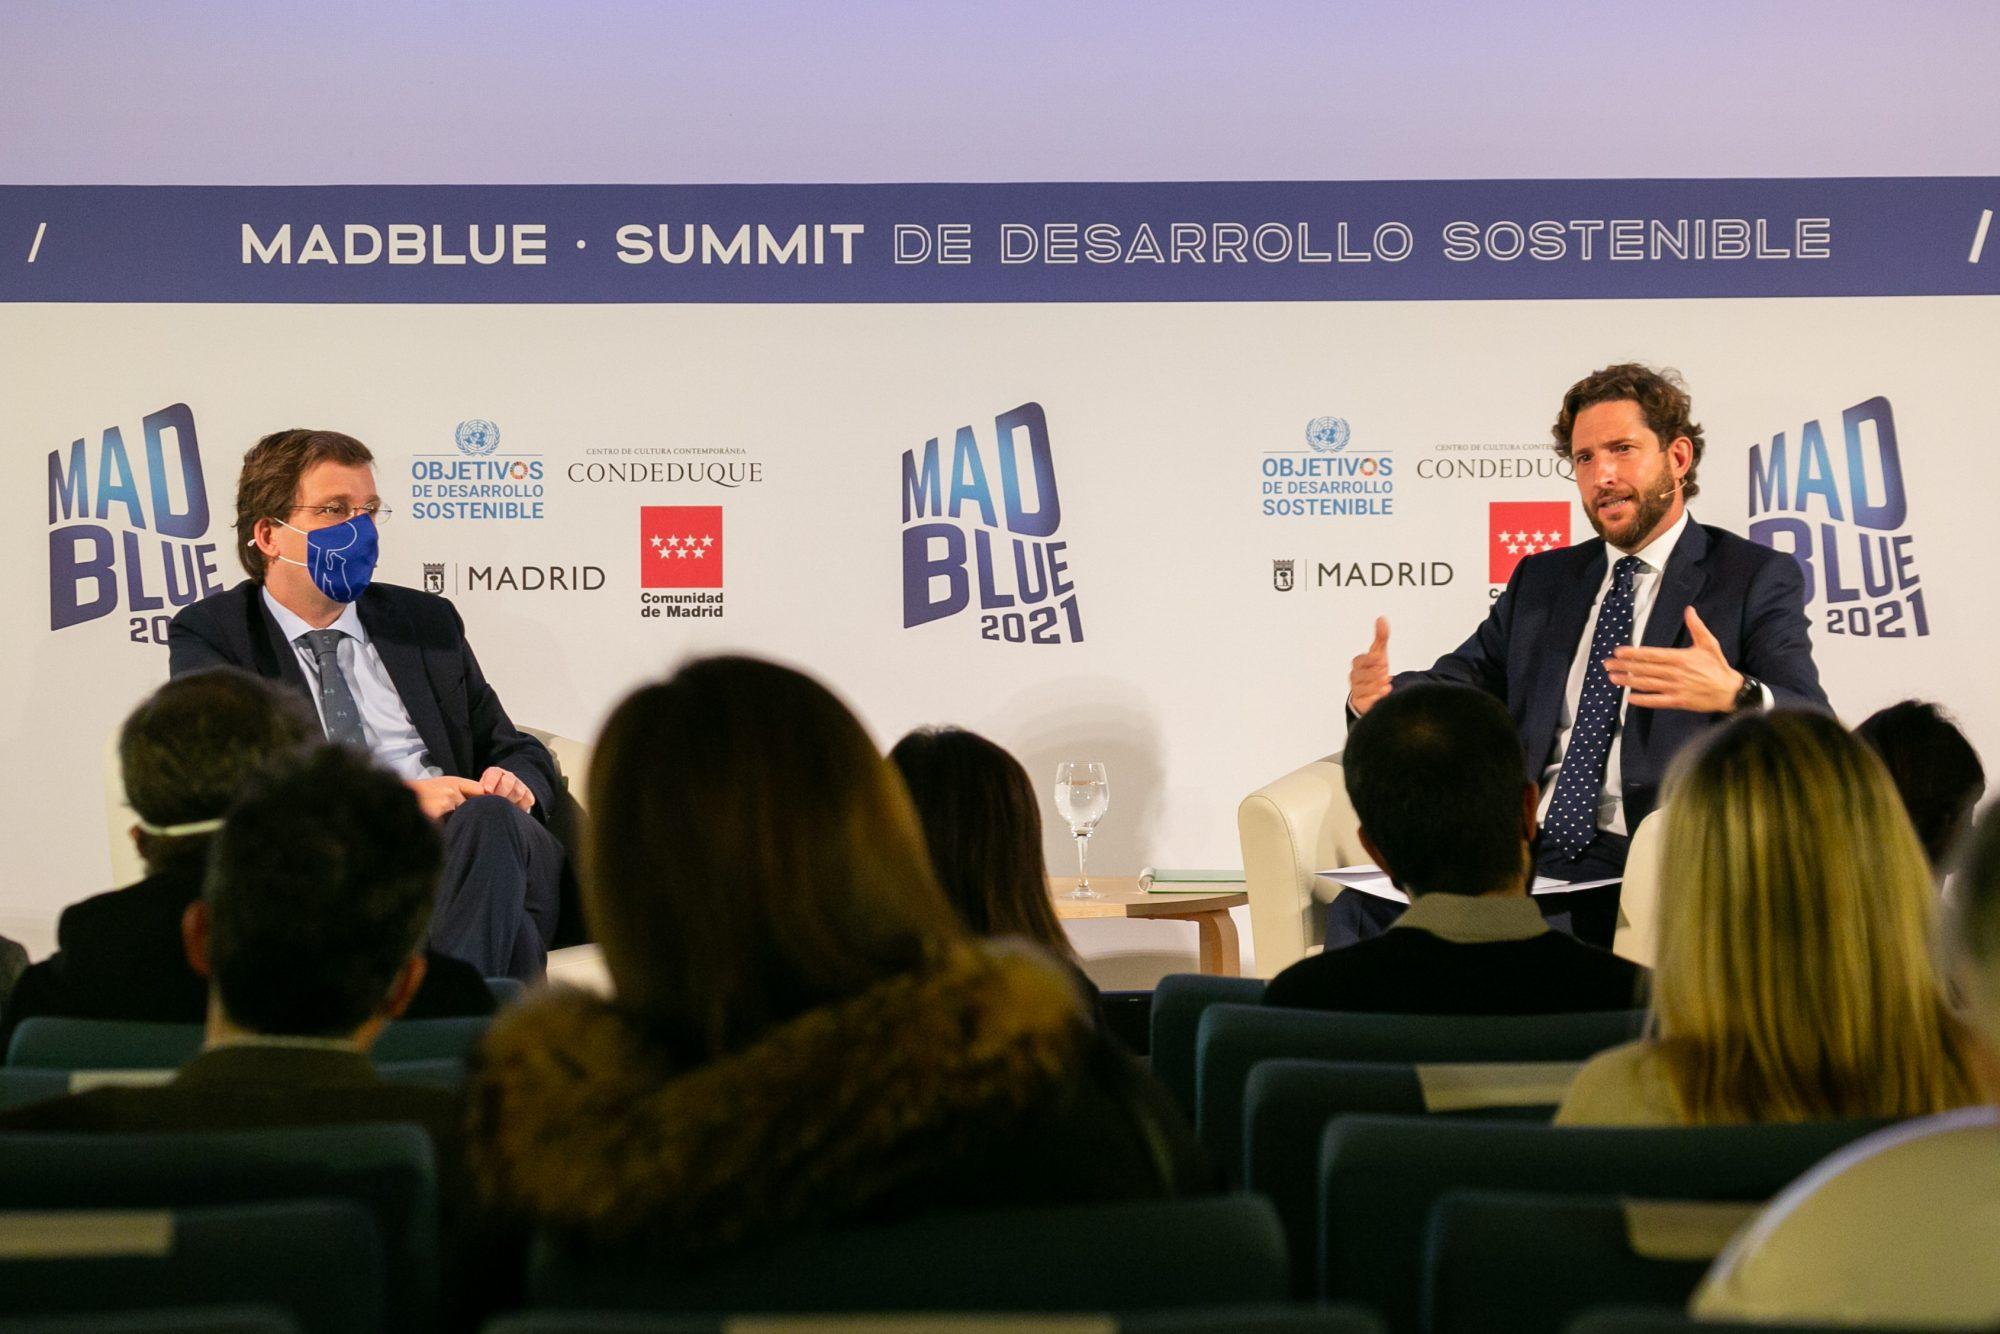 MadBlue Summit.  Madrid 16-22 de abril 2021